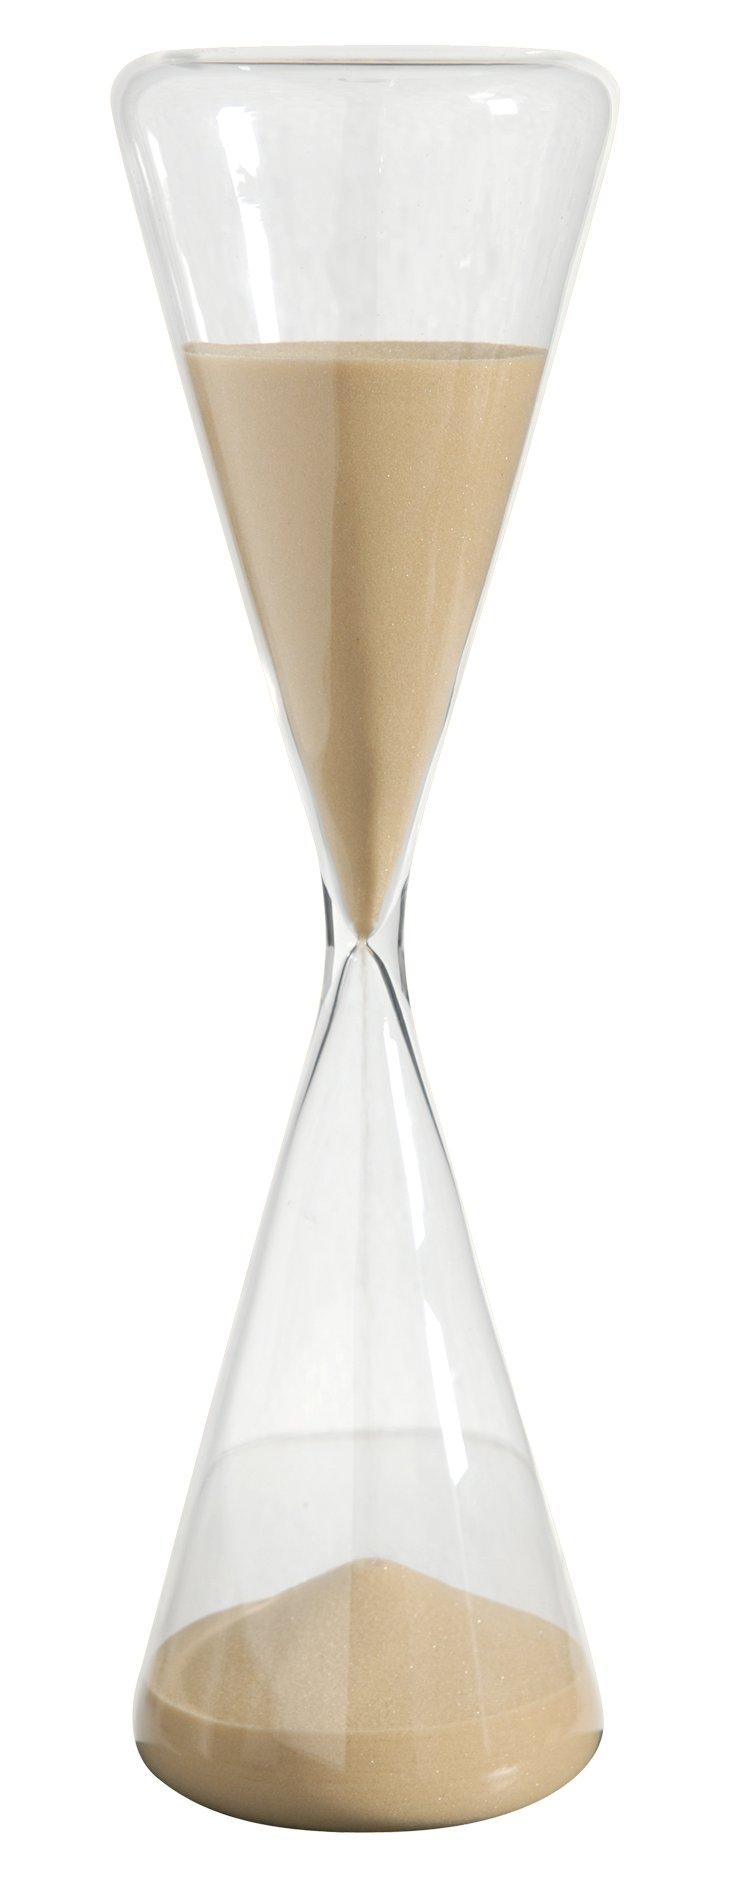 Sand Hour Glass, Tan